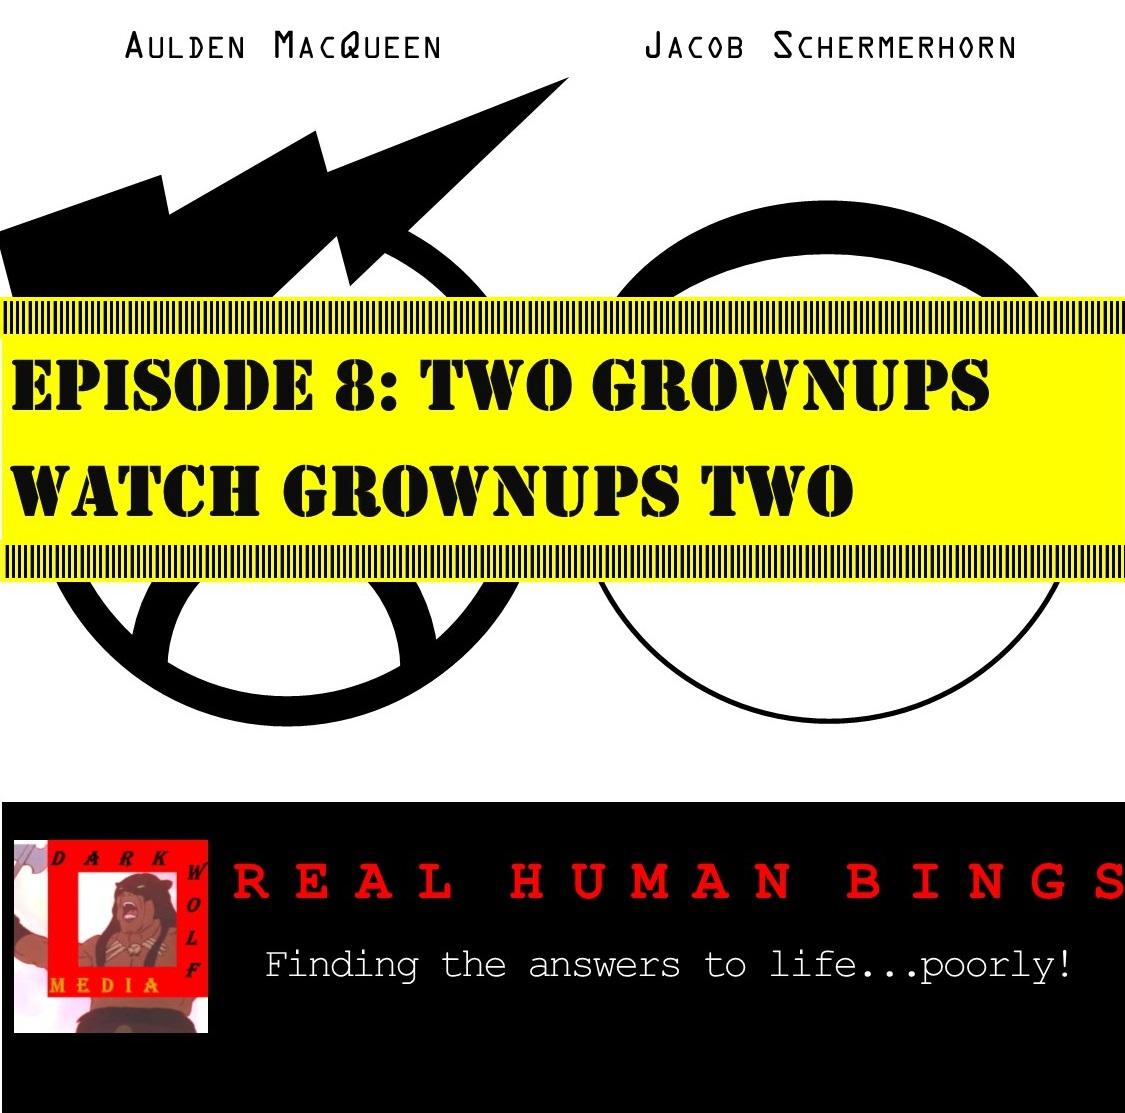 Two Grownups Watch Grownups Two.jpg